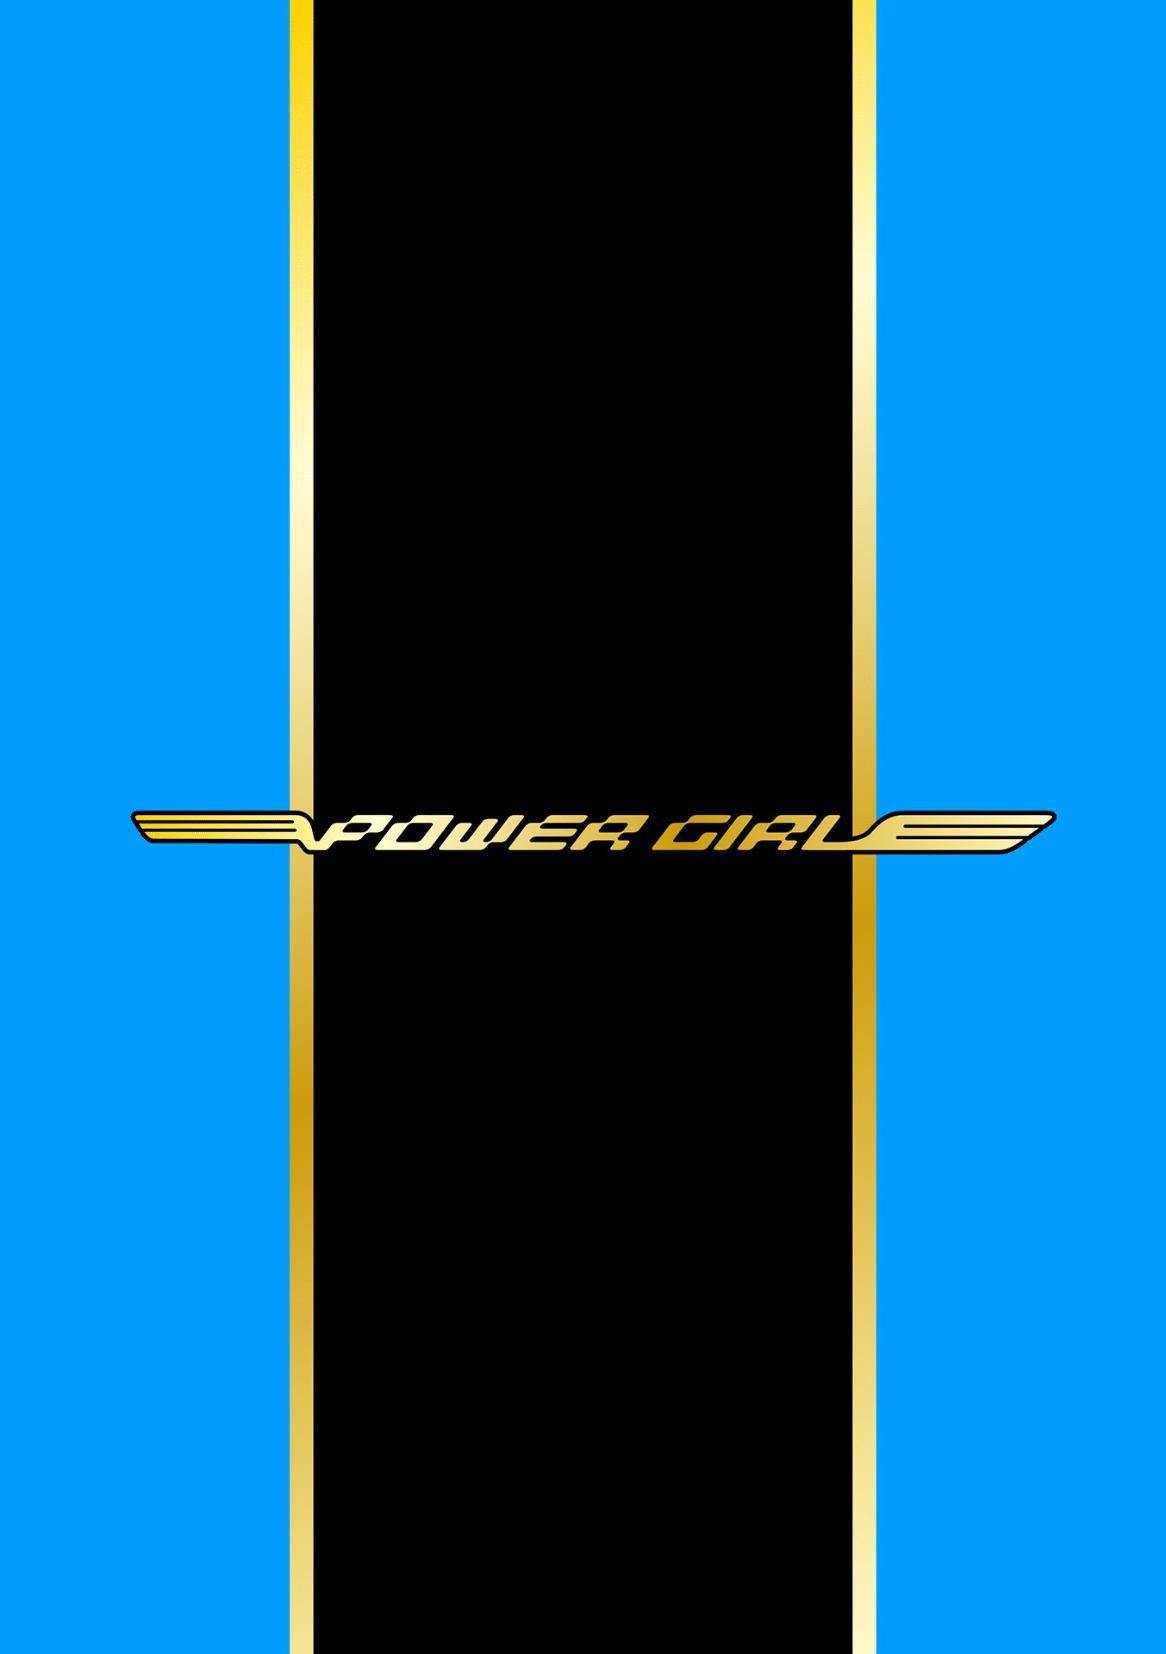 [Rinsun] Power Girl ~JK Super Heroine no Saiin Darakuki~ Ch. 2|Power Girl ~JK Super Heroine's Aphrodisiac Corruption Record~ Ch. 2 [English] [Neraka Translations] 1